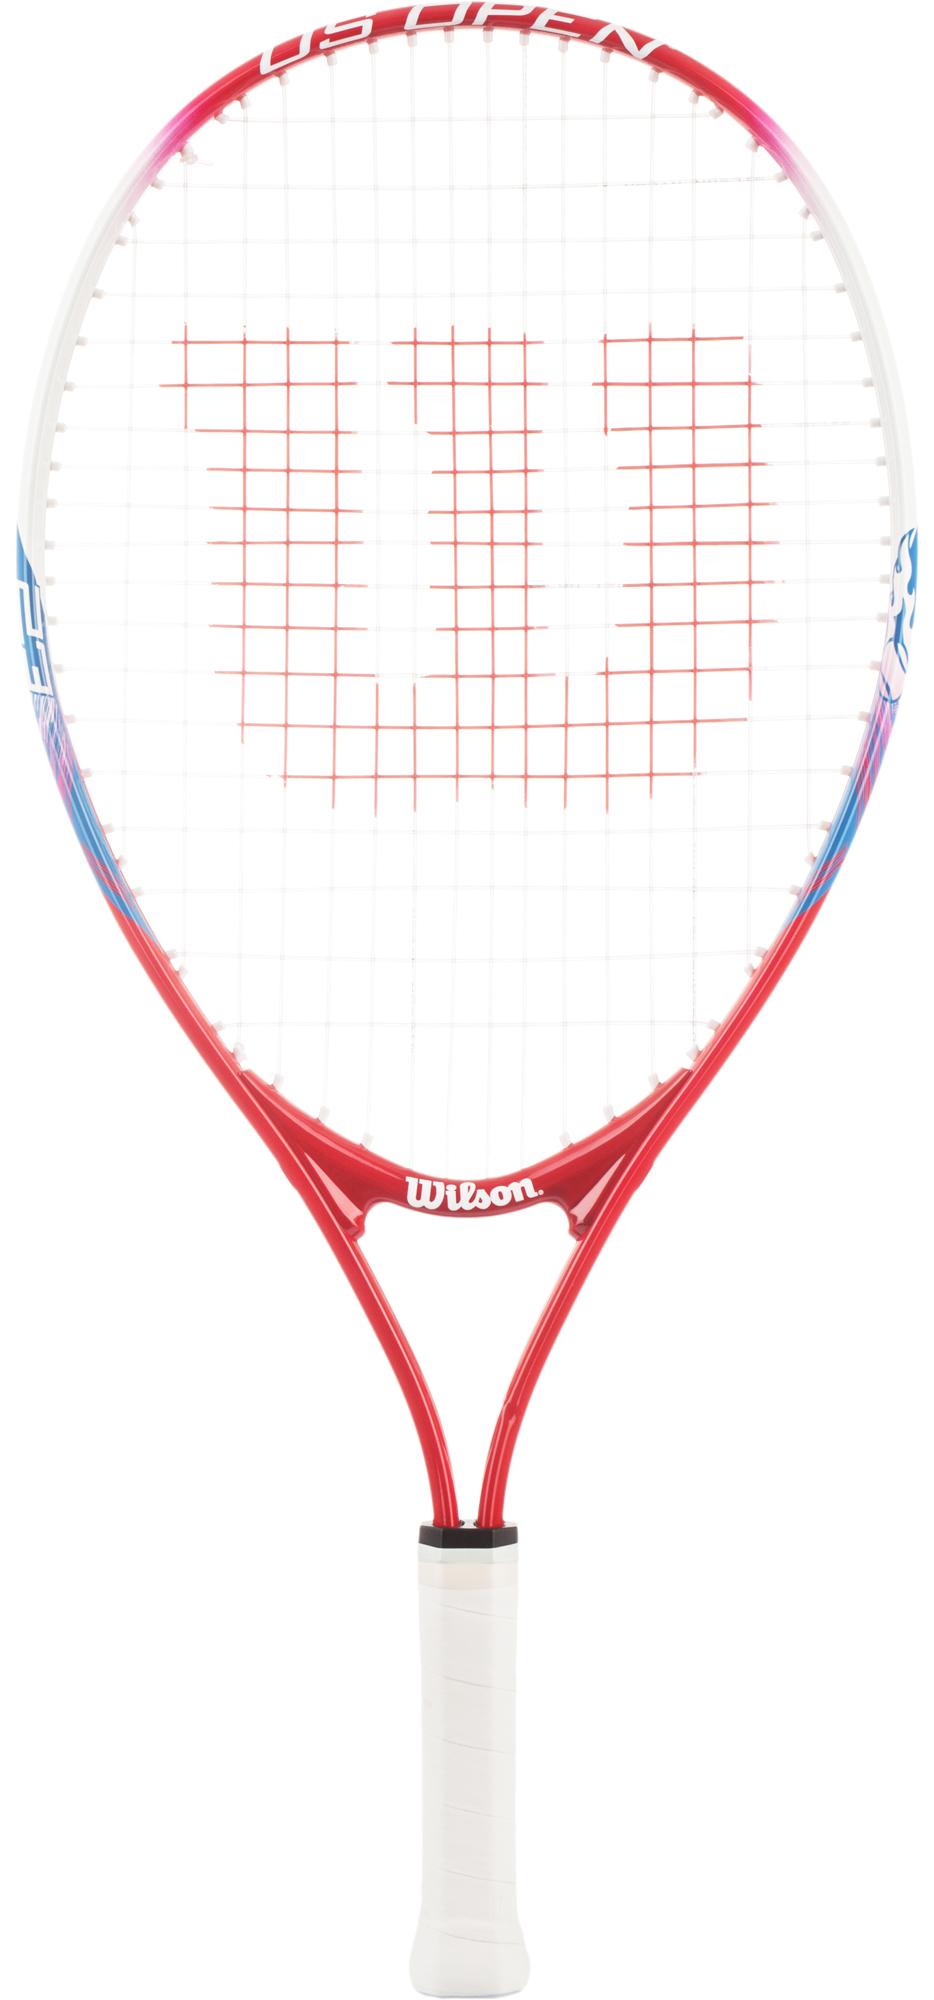 Wilson Ракетка для большого тенниса детская Wilson US Open 23, размер Без размера wilson набор мячей для большого тенниса wilson us open x3 размер без размера